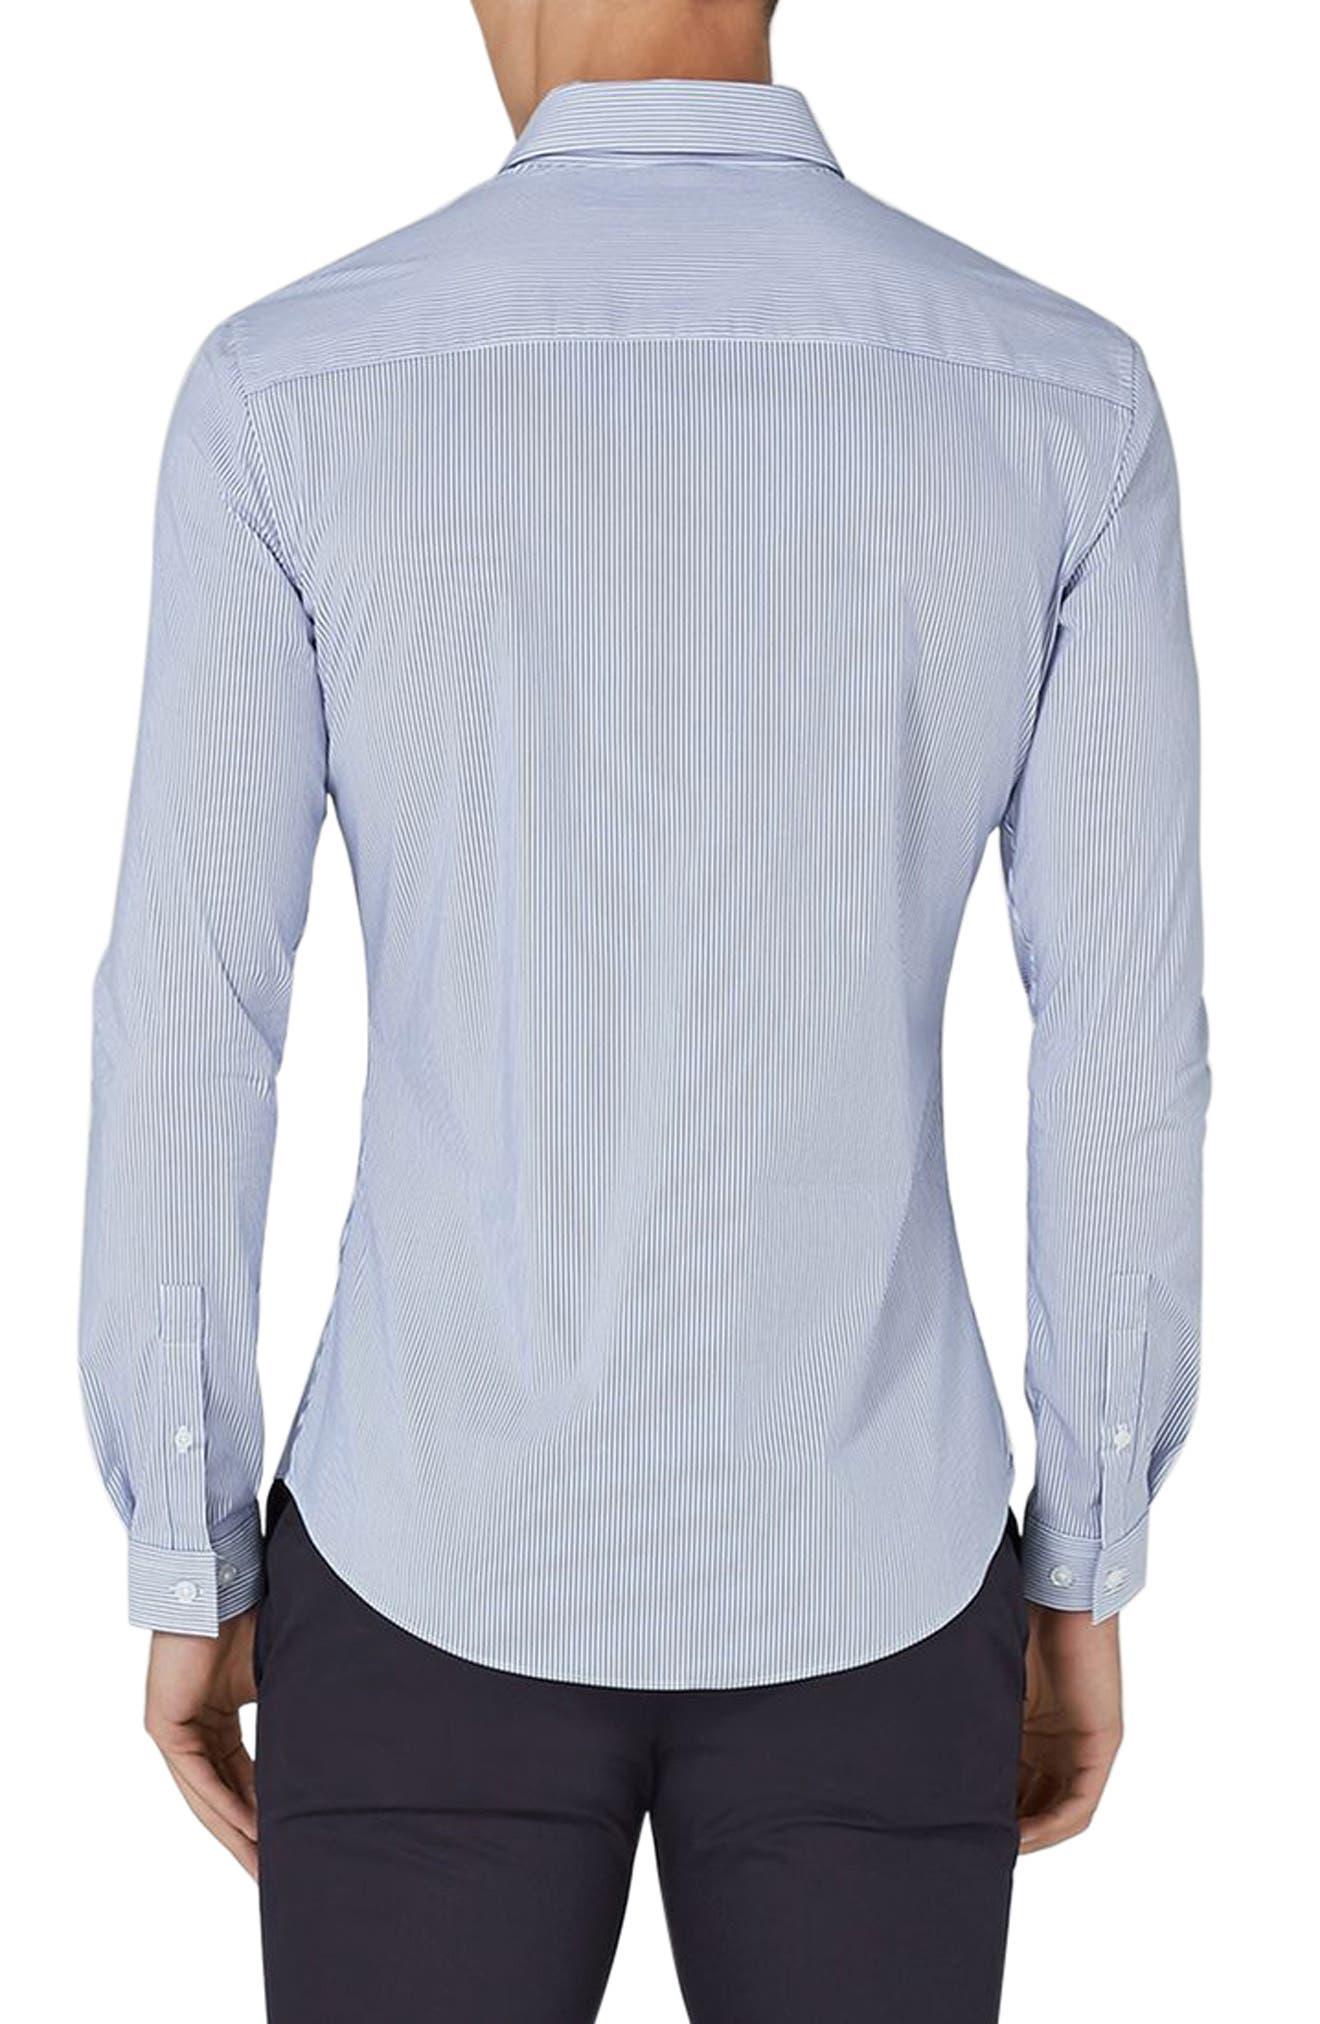 Muscle Fit Smart Shirt,                             Alternate thumbnail 3, color,                             Blue Multi